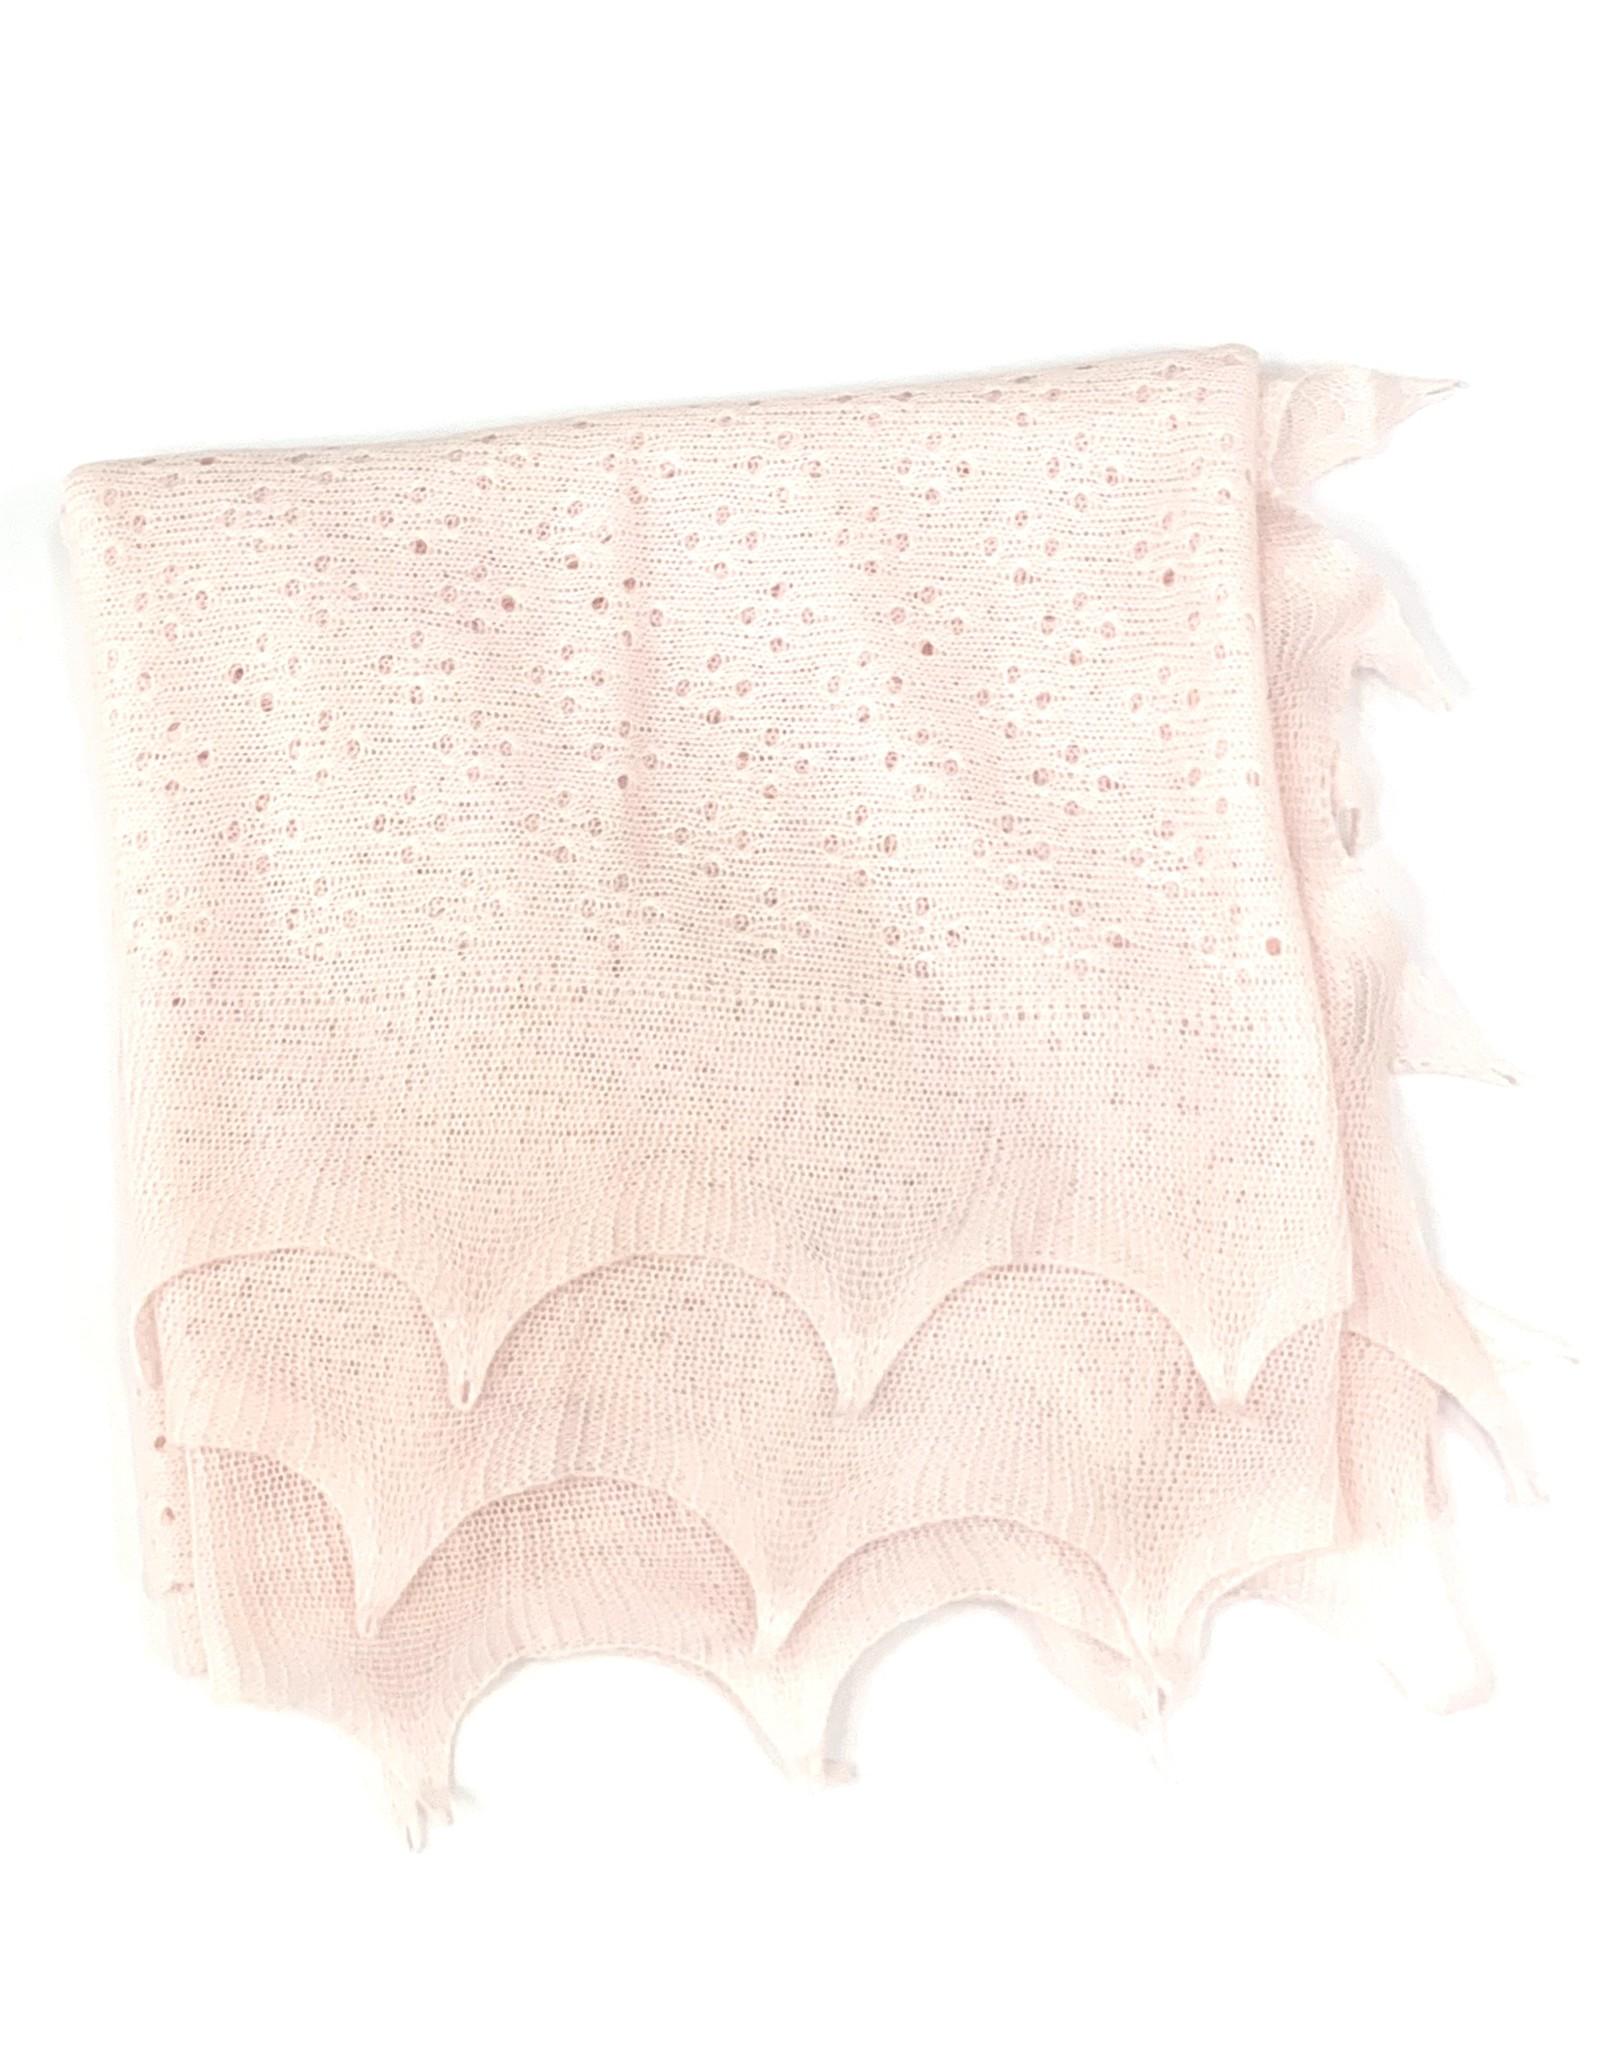 Sarah Louise Woven Baby Blanket